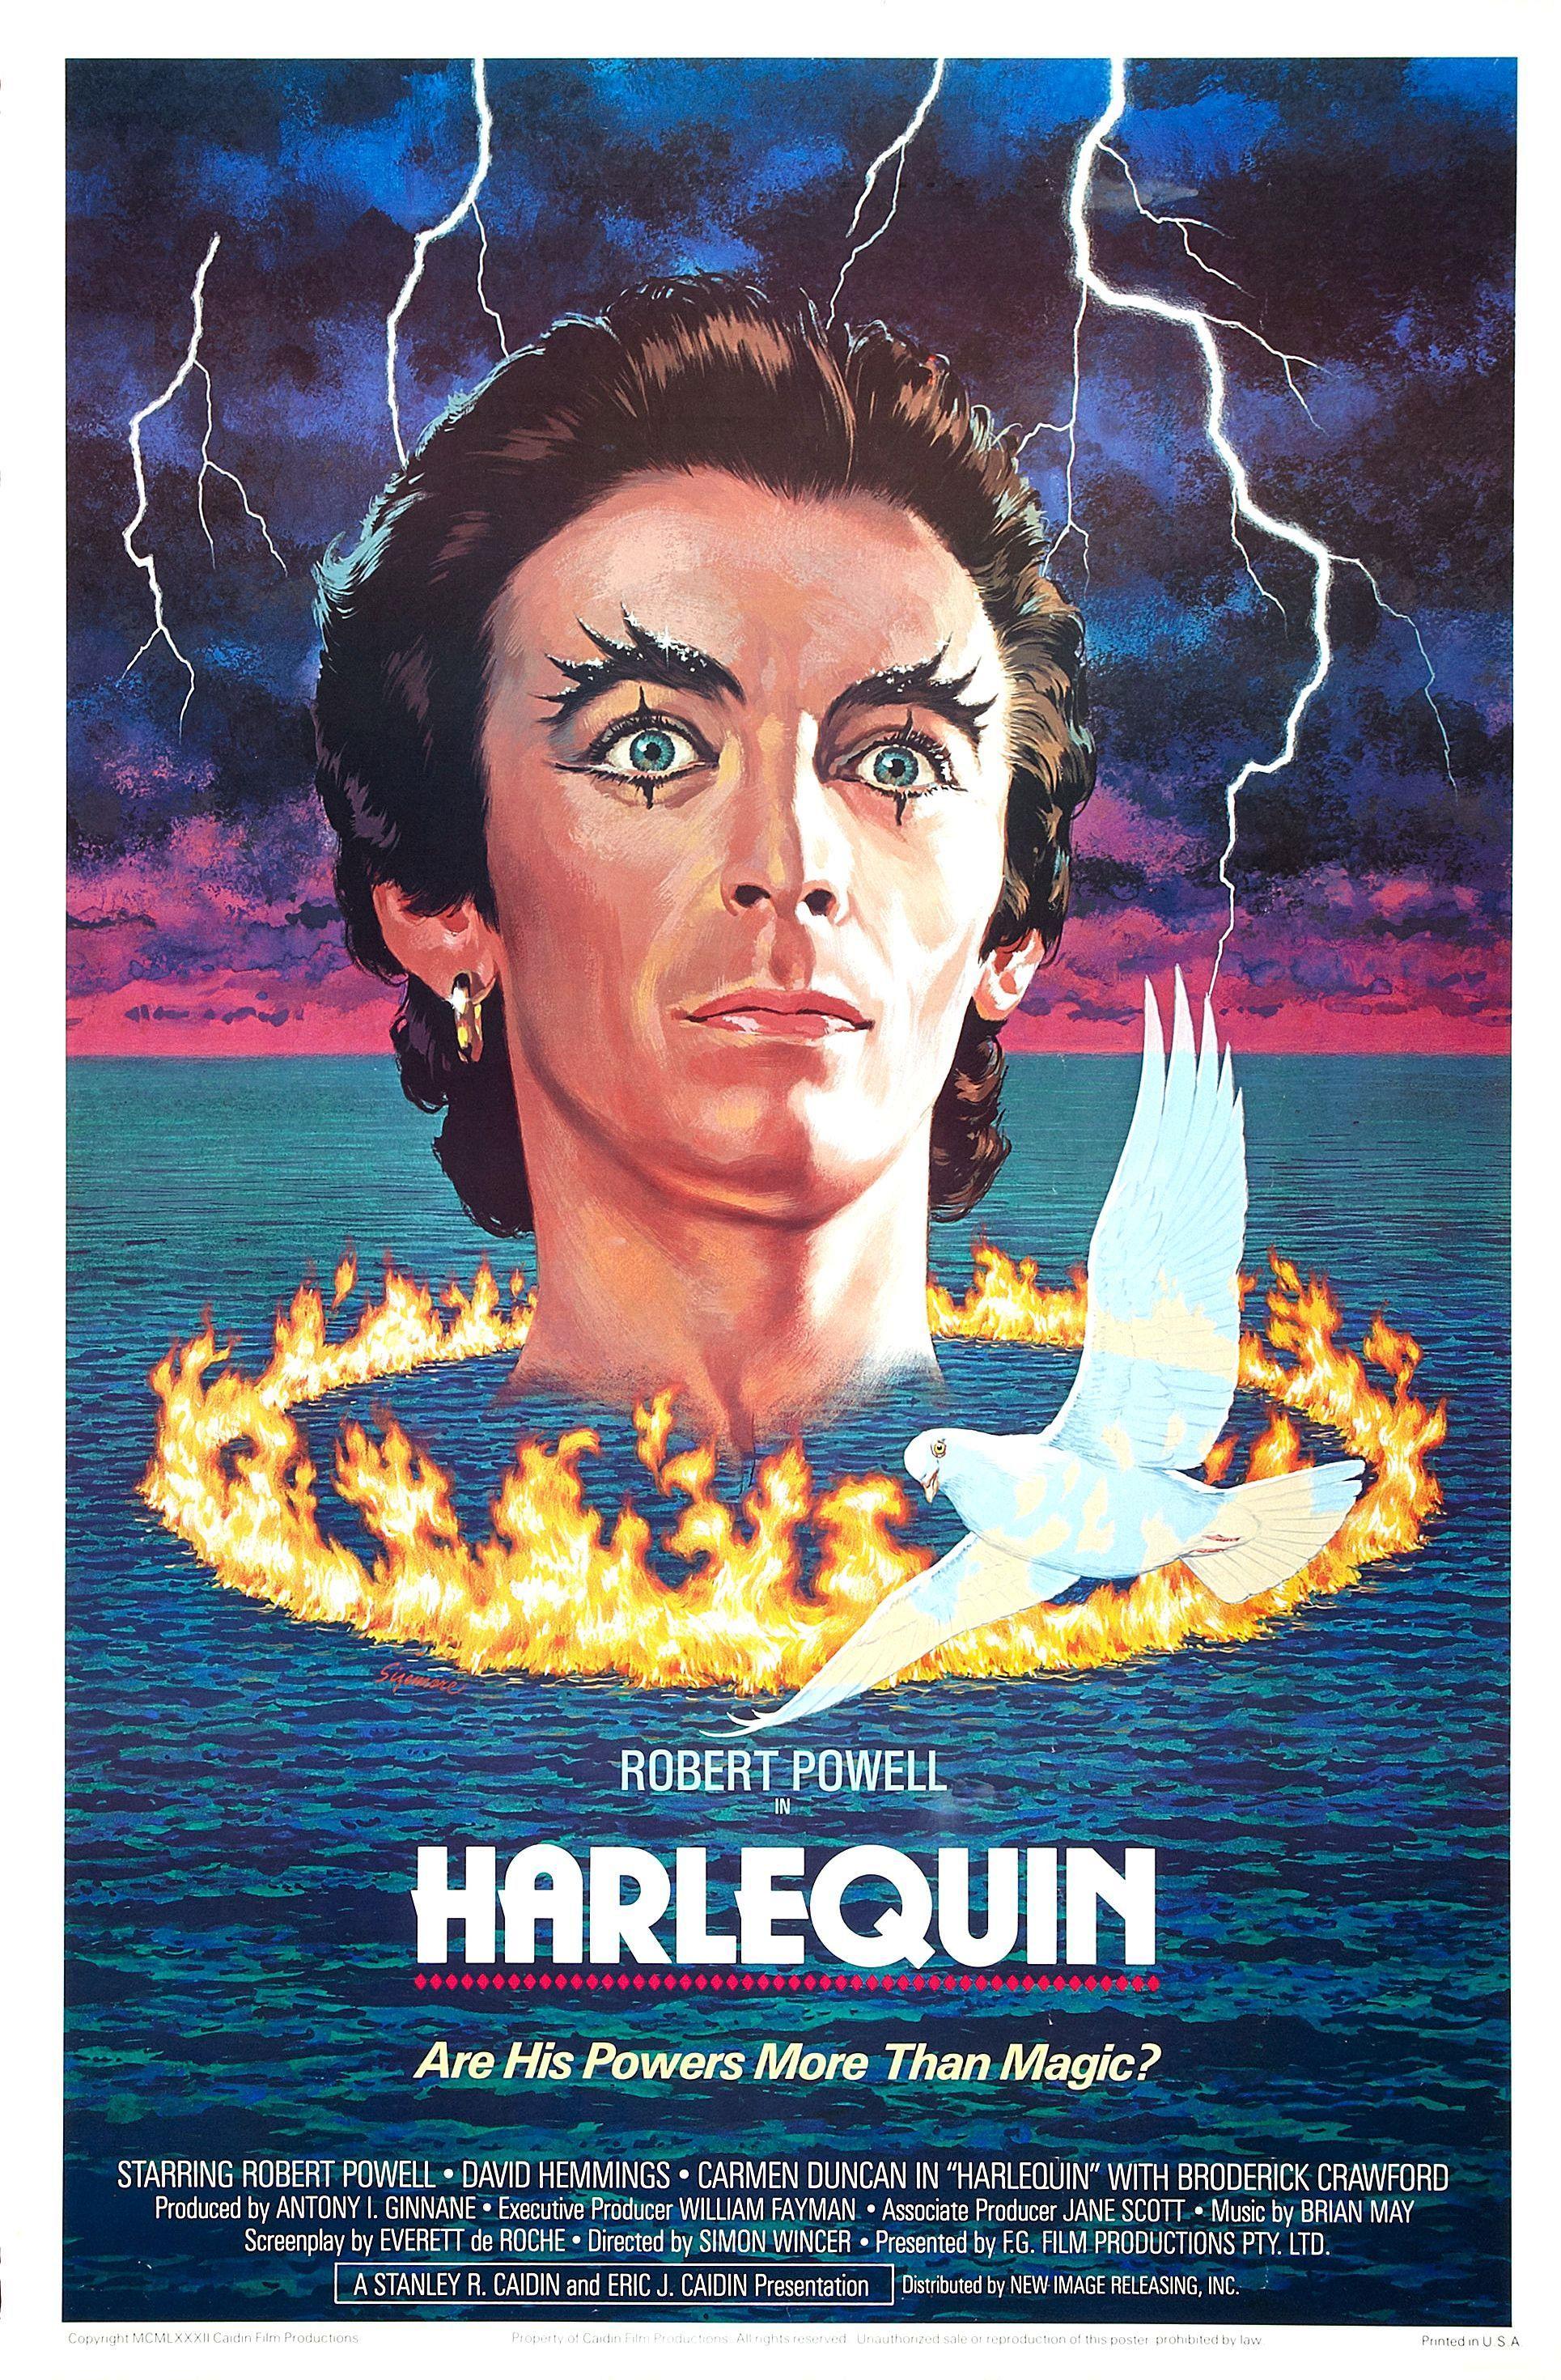 Harlequin  Australia Design Print Poster Posters For Horror Sci Fi Exploitation Cult Trash Adult And B Movies Illustration Illustrations